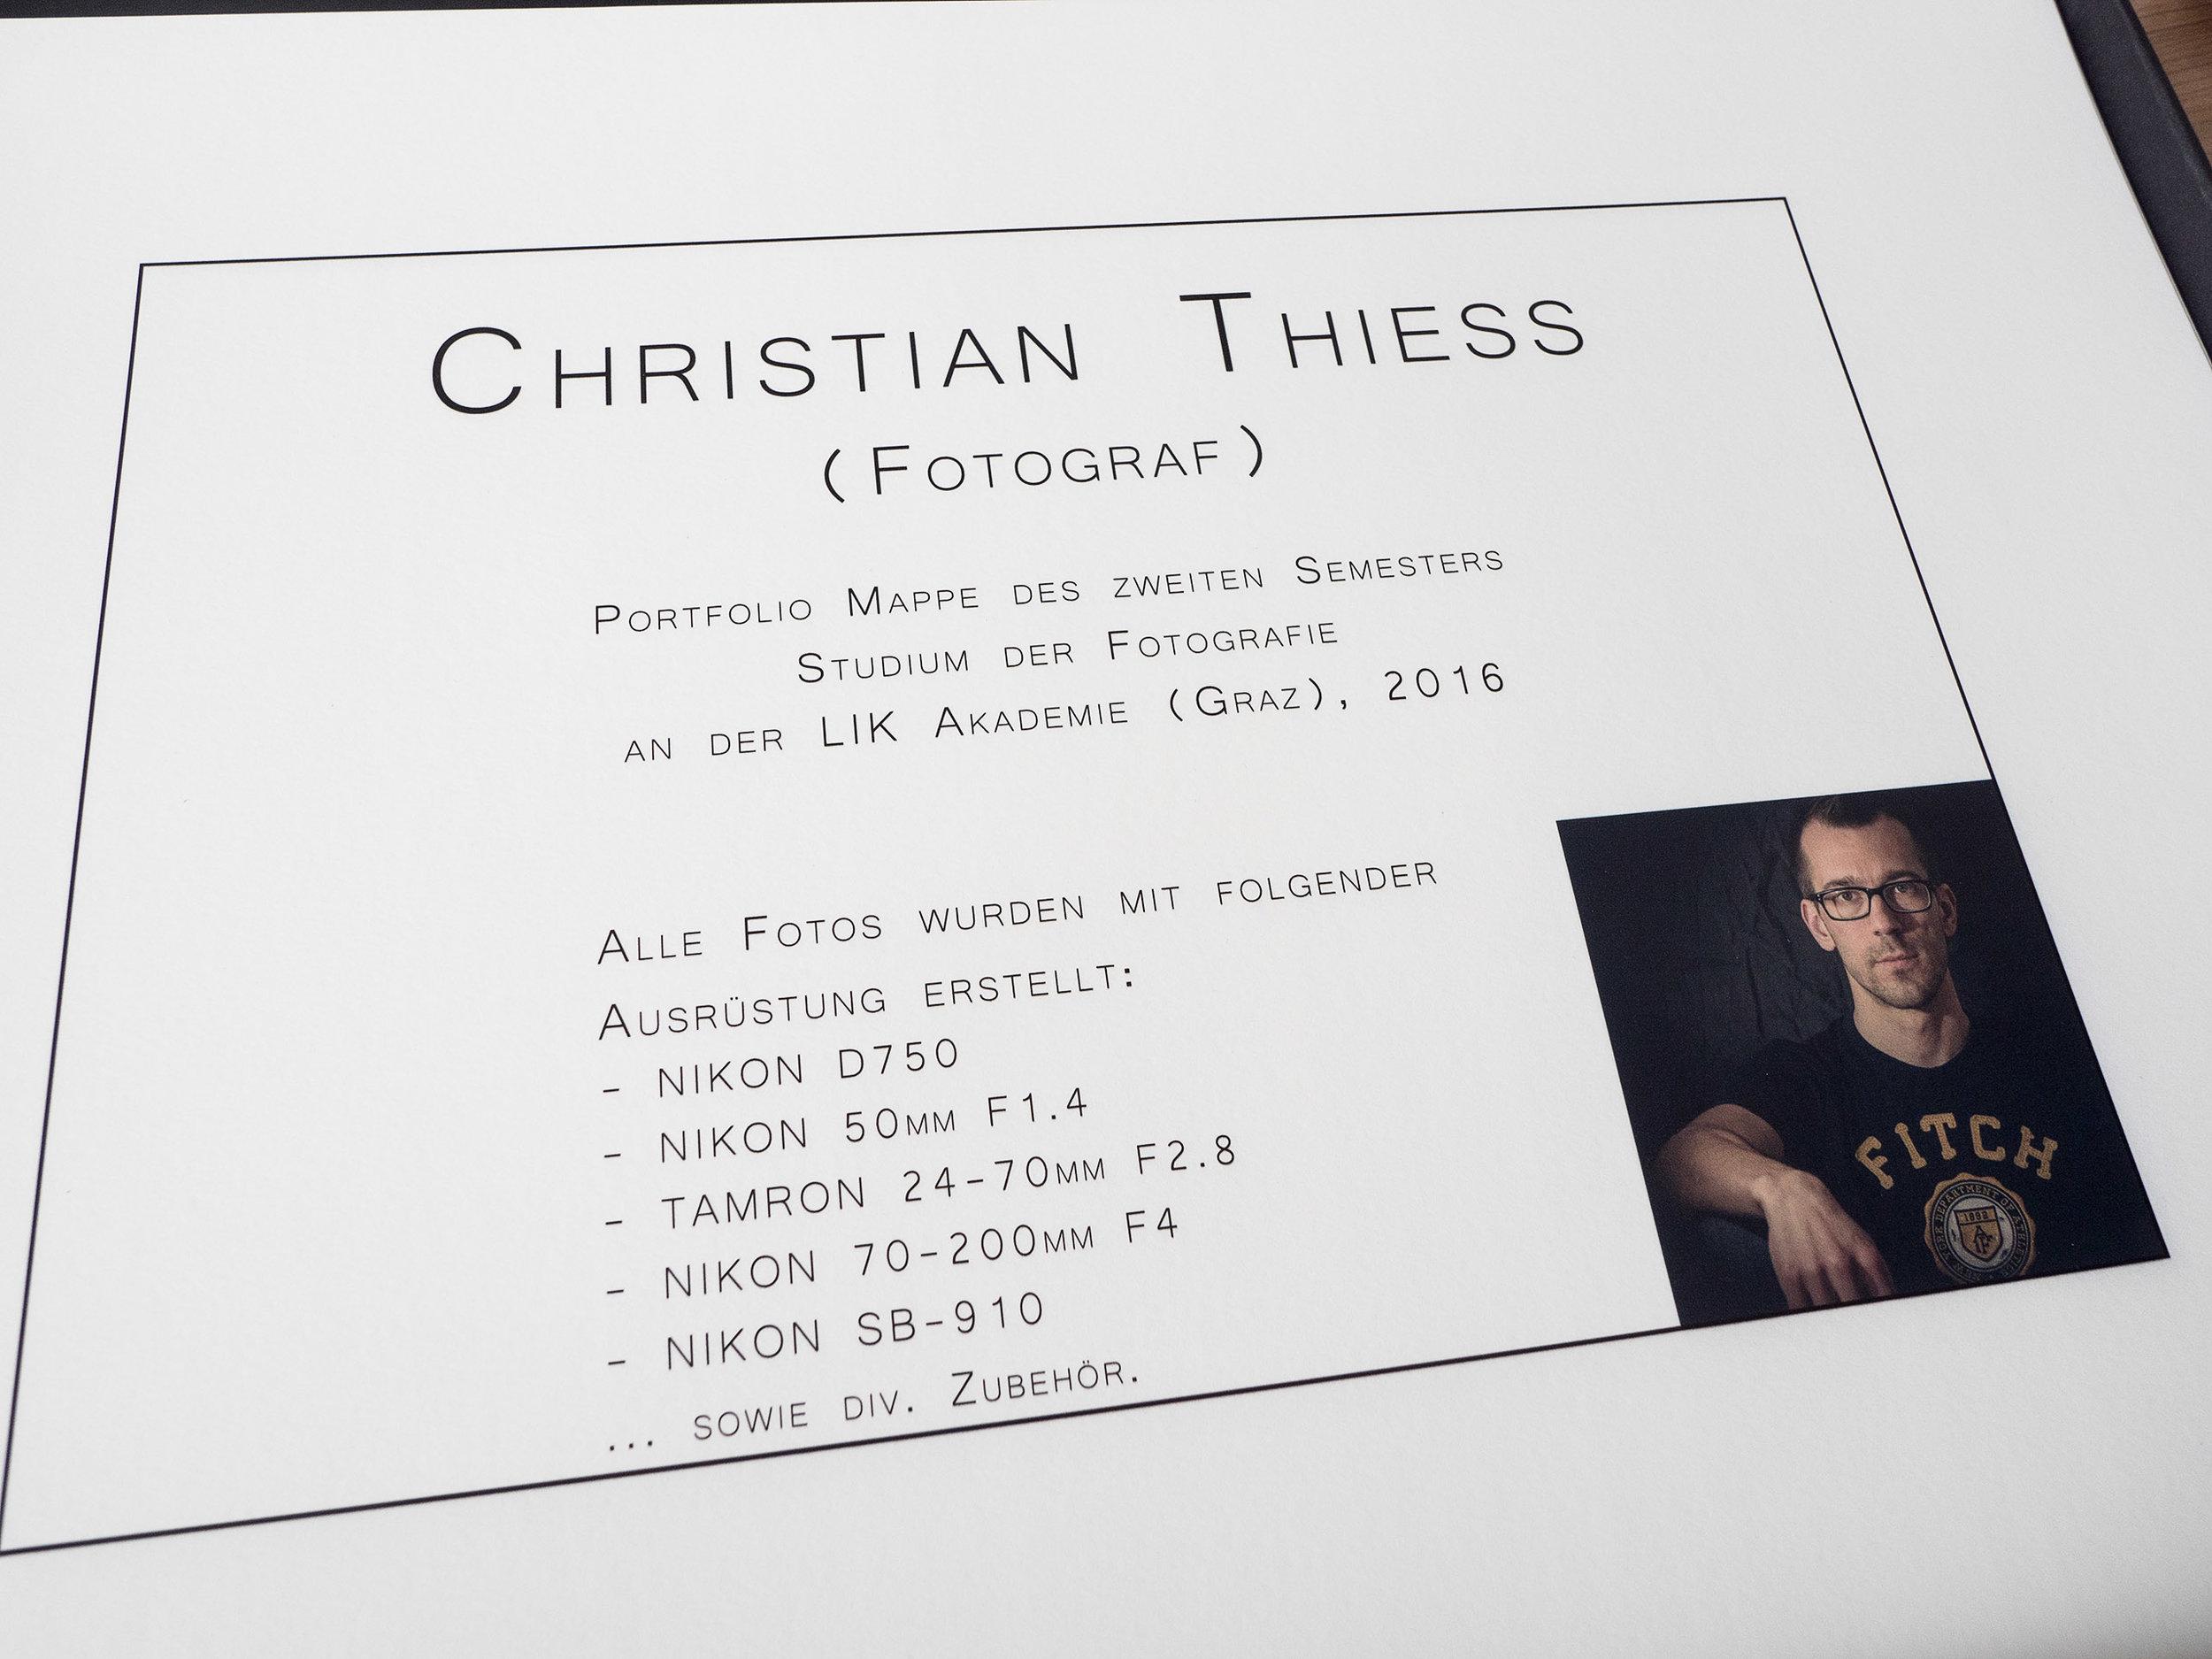 ChristianThiess